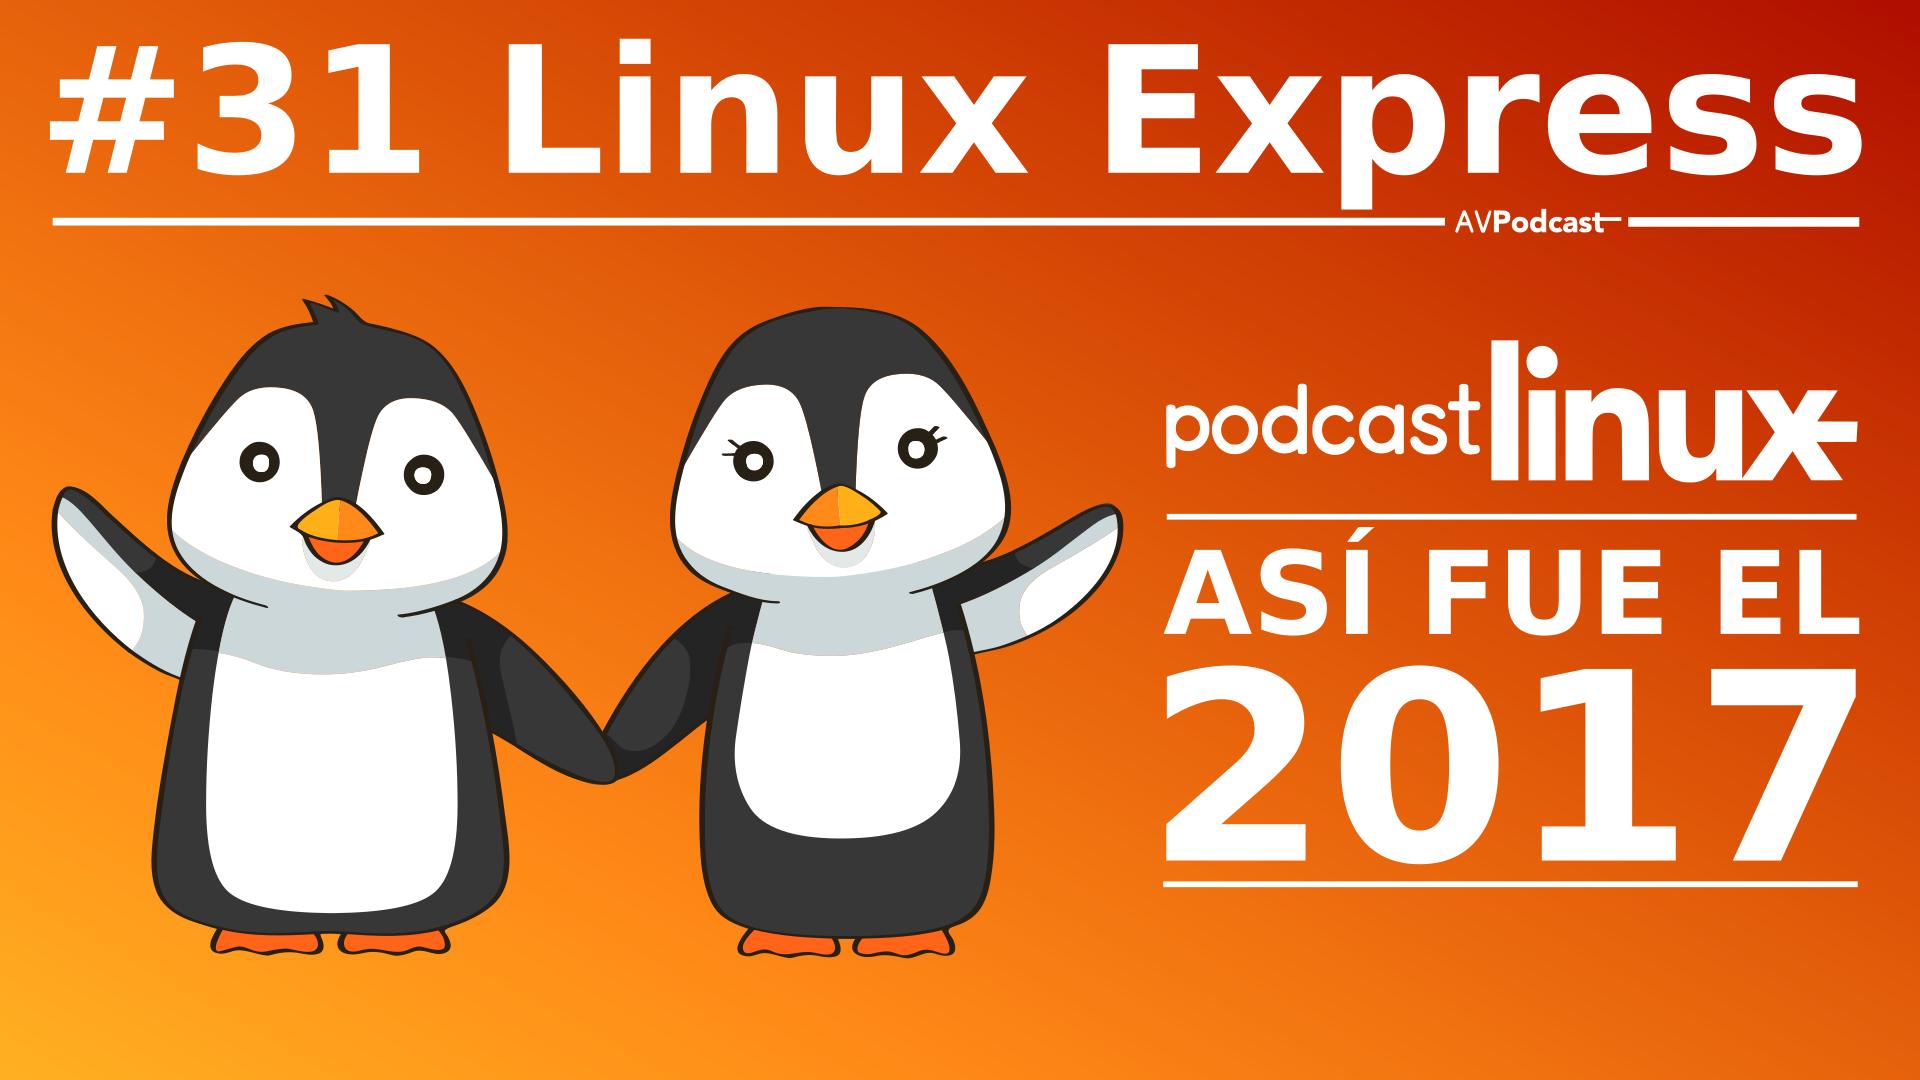 #31 Linux Express